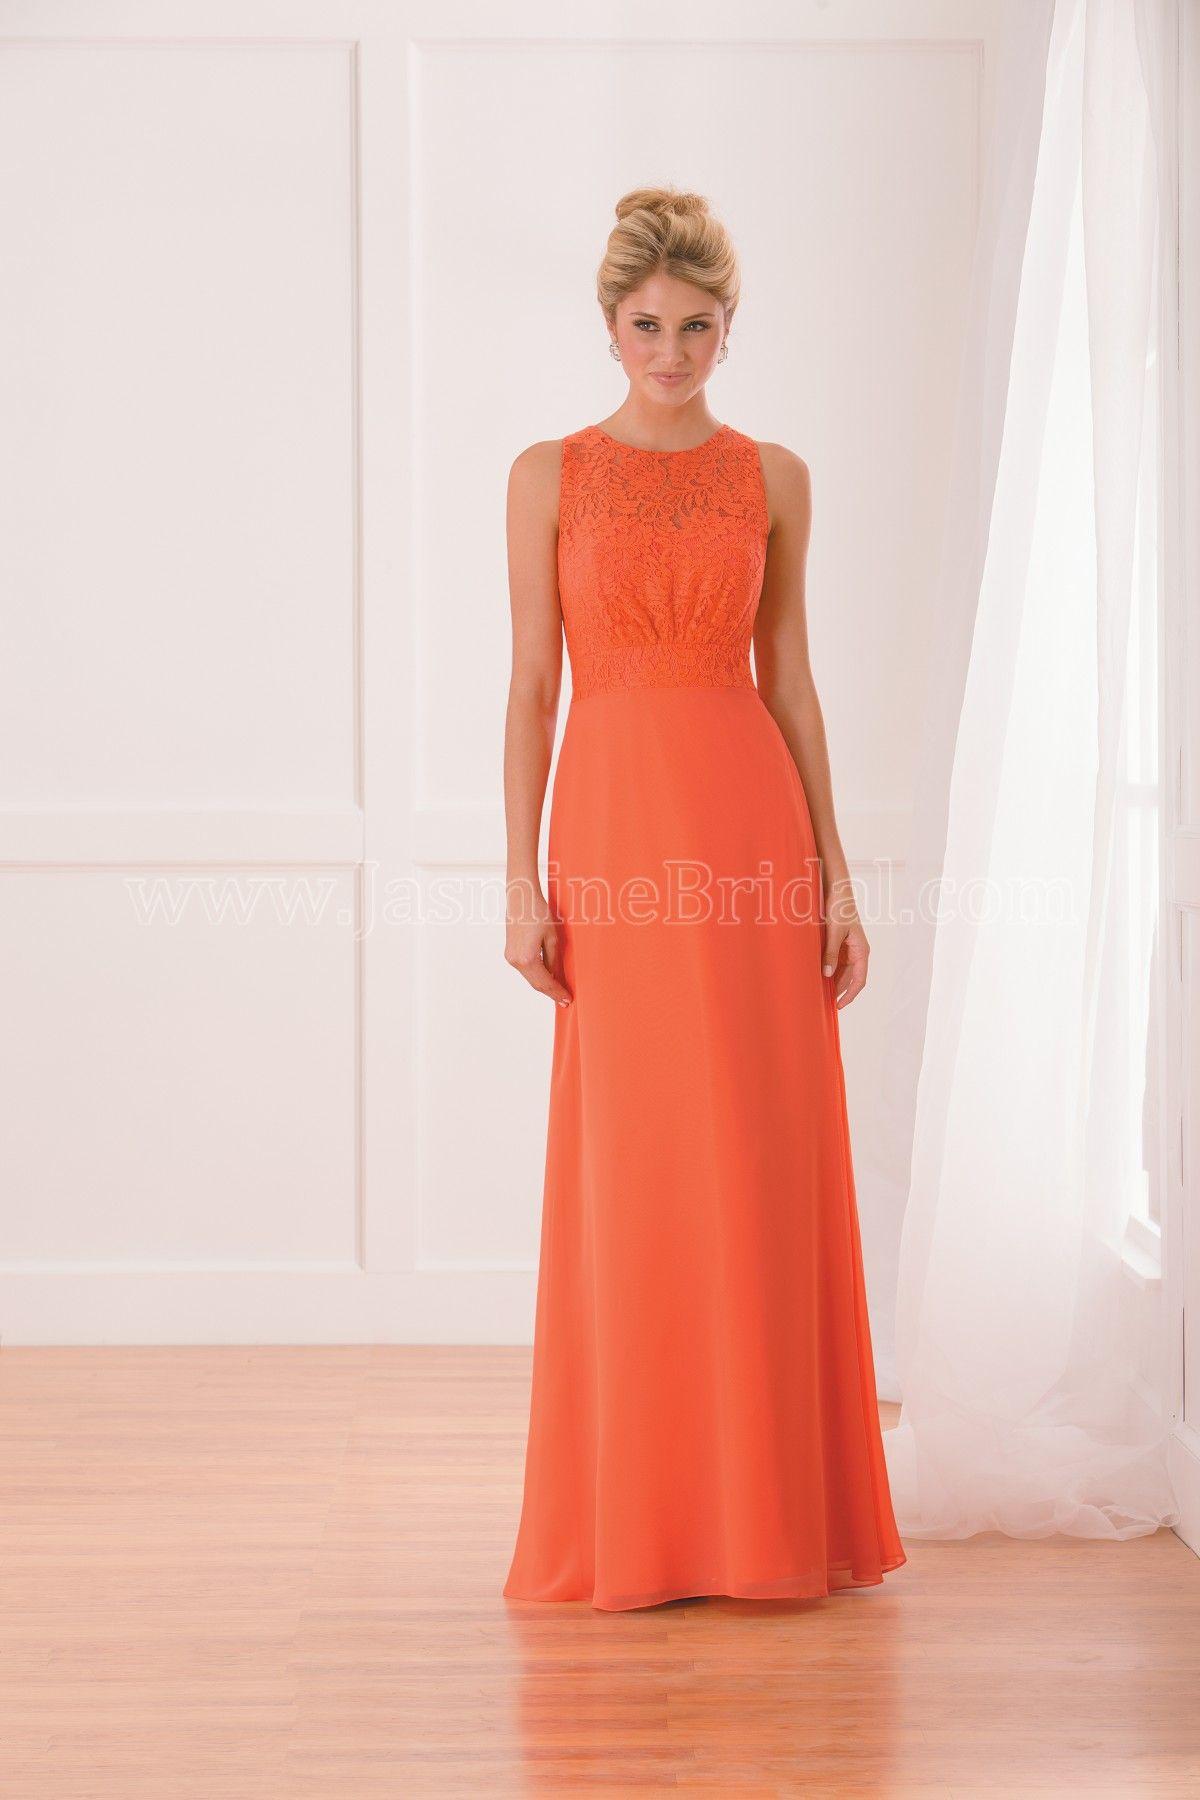 Jasmine bridal bridesmaid dress b2 style b173005 in orange a simple jasmine bridal bridesmaid dress b2 style b173005 in orange a simple yet elegant orange bridesmaid ombrellifo Gallery